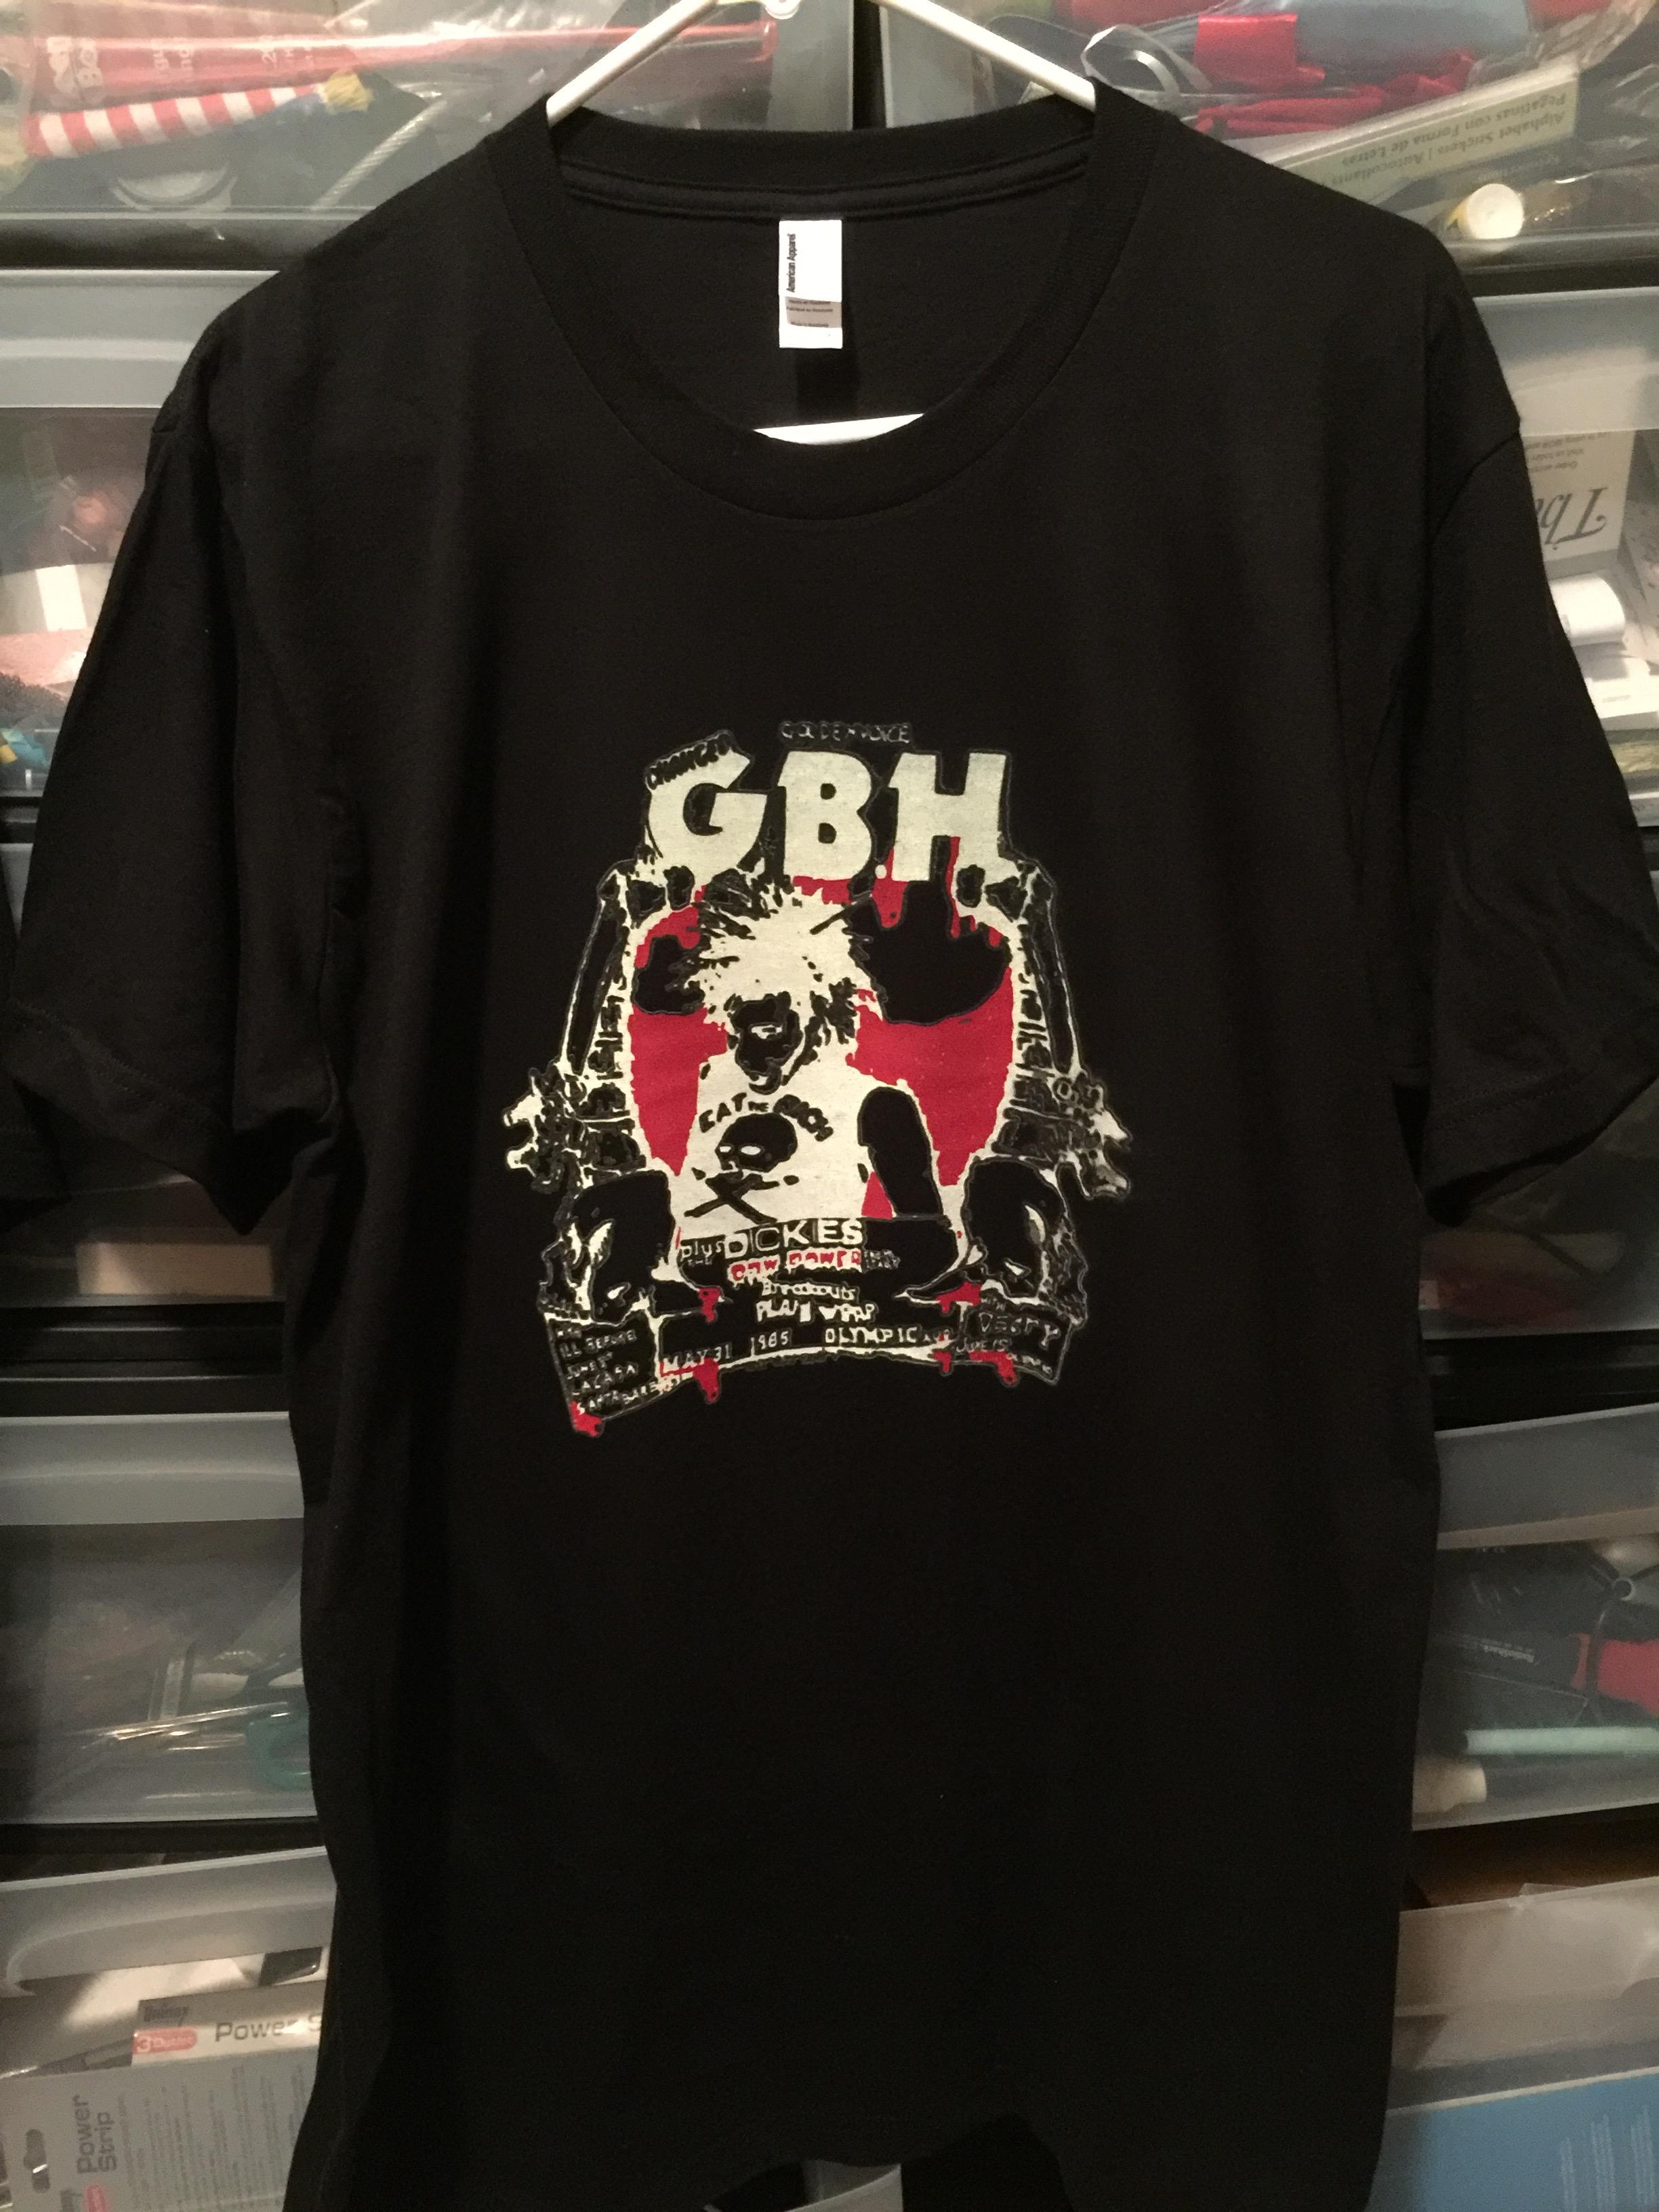 dcf3cb30b Old Punk Rock Concert T shirt GBH Dickies Olympic Auditorium Tshirt Black (free  shipping)